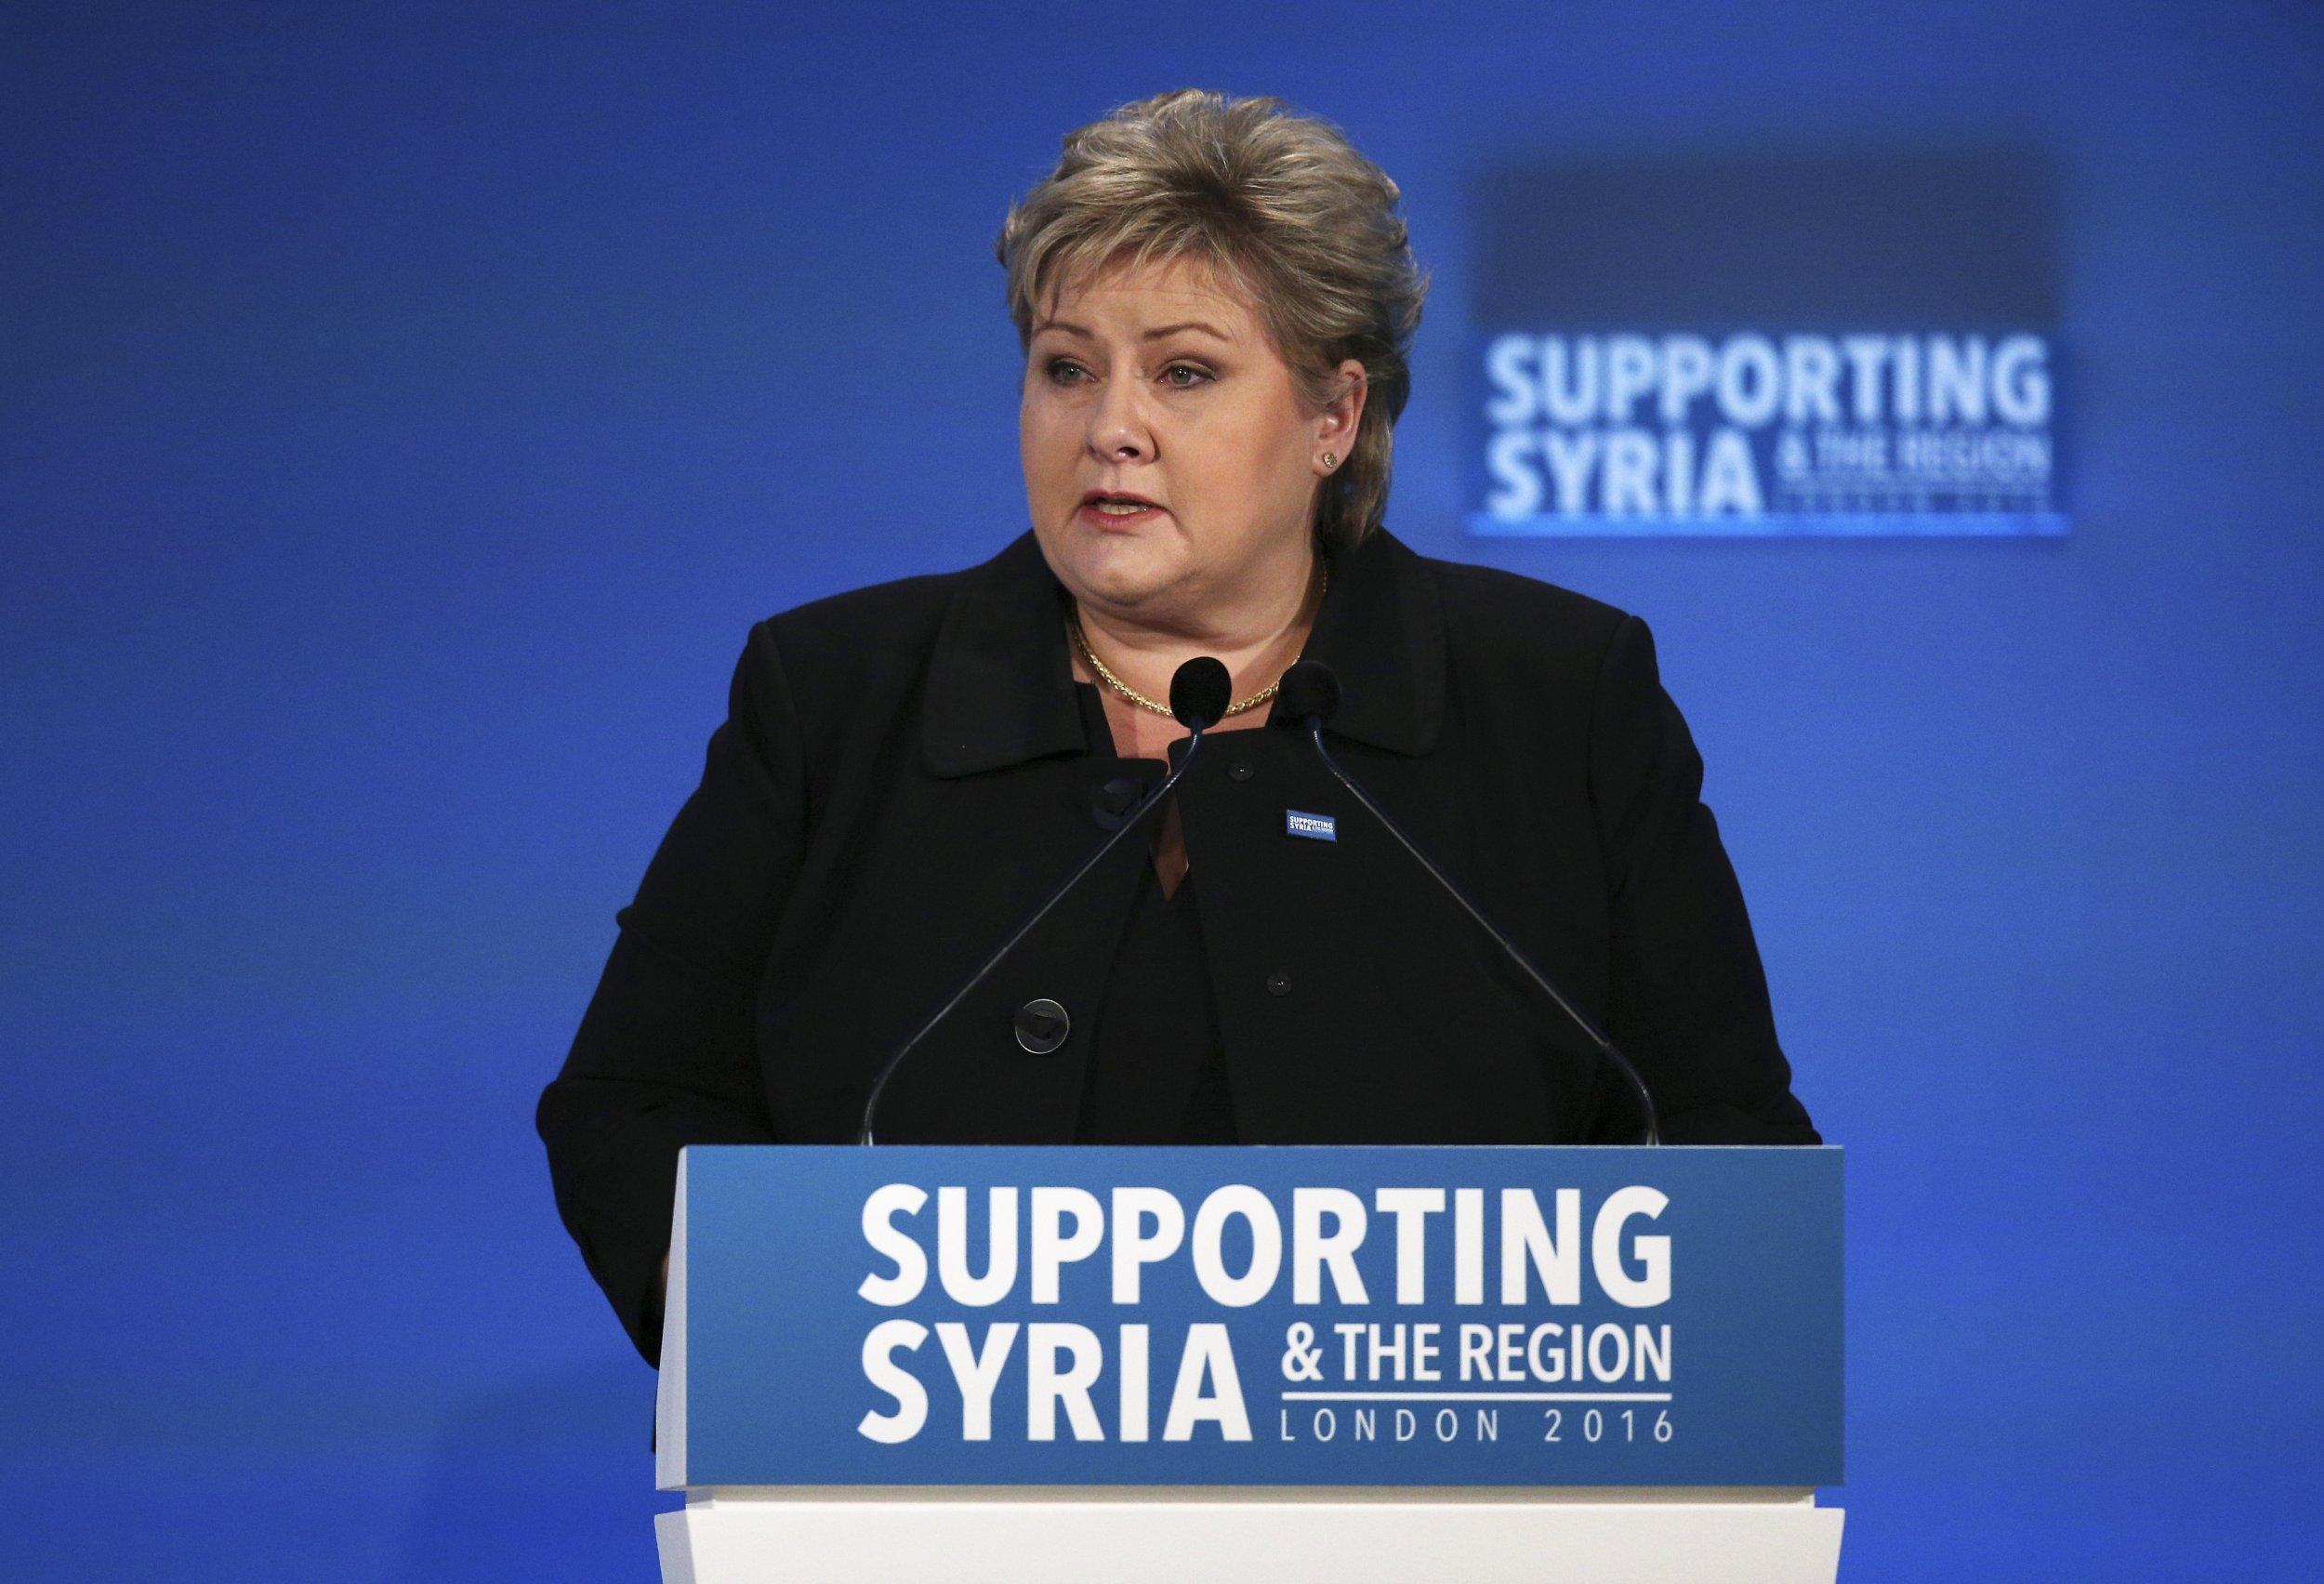 Norway Prime Minister Erna Solberg